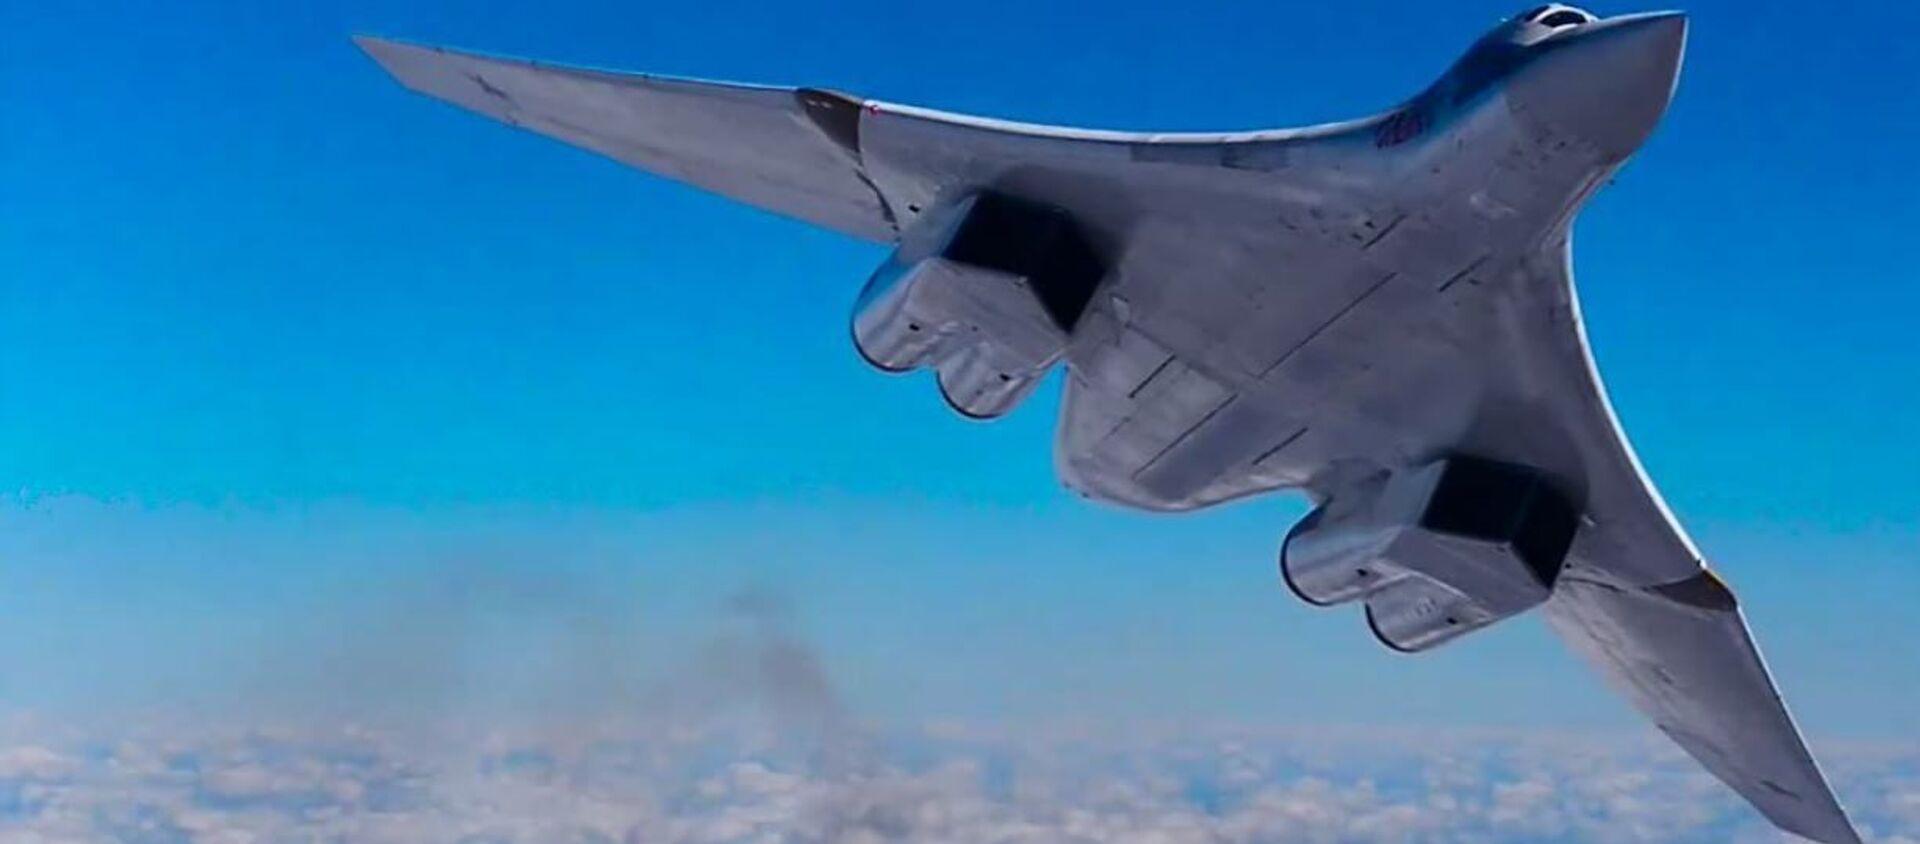 Bombardero ruso Tu-160 'cisne blanco' - Sputnik Mundo, 1920, 06.07.2019